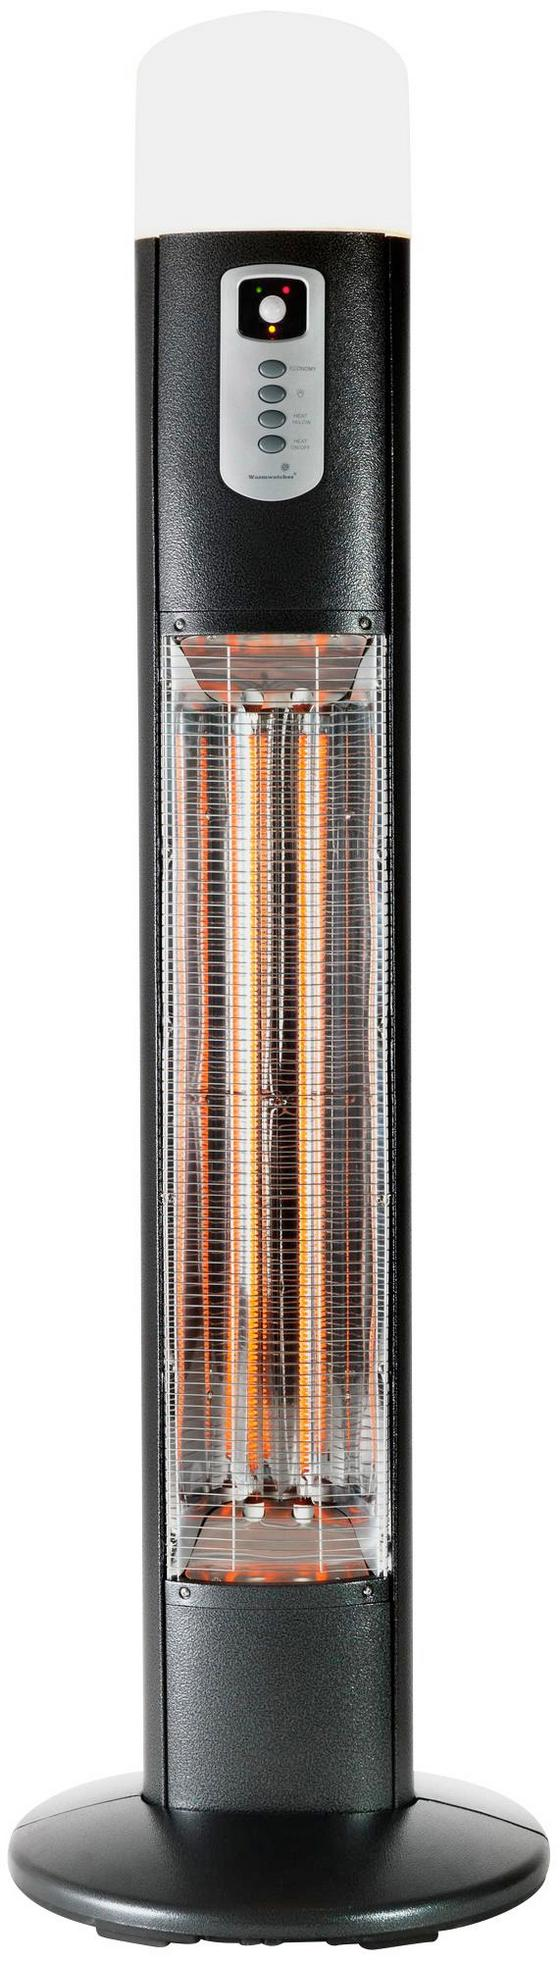 Heizstrahler Warmwatcher Diana - Grau, MODERN, Metall (50/170cm)